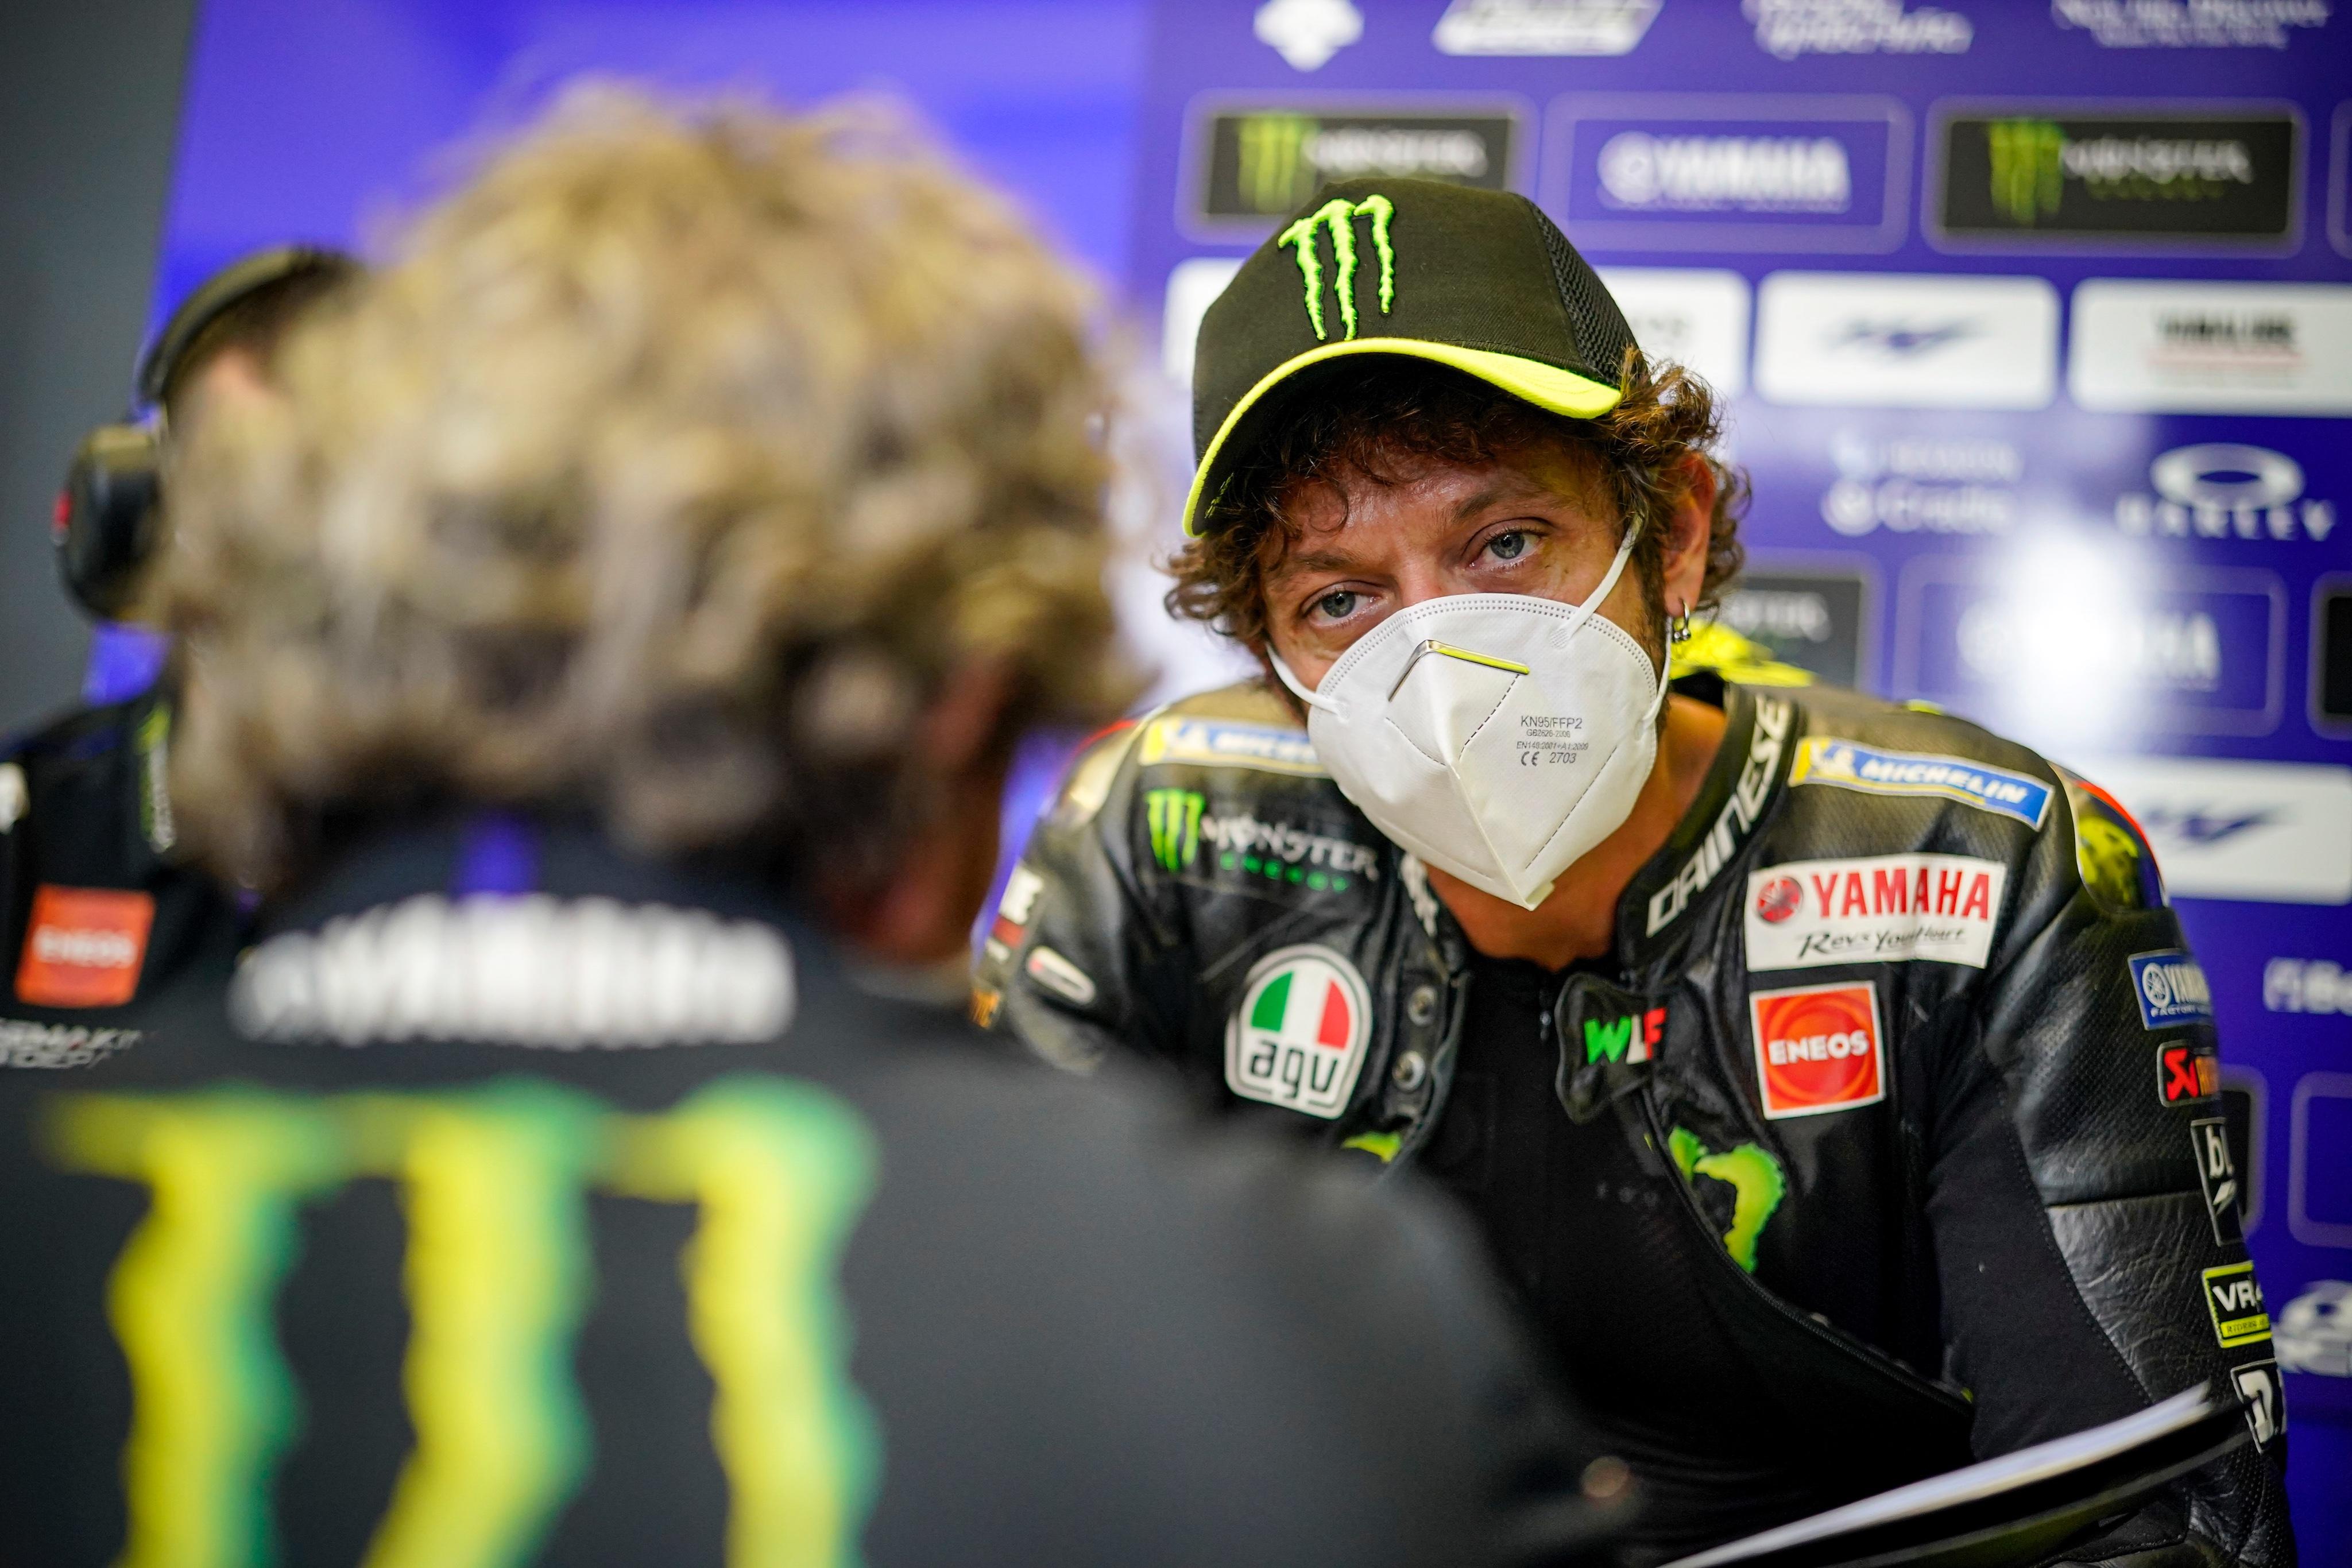 Twitter/Monster Energy Yamaha MotoGP